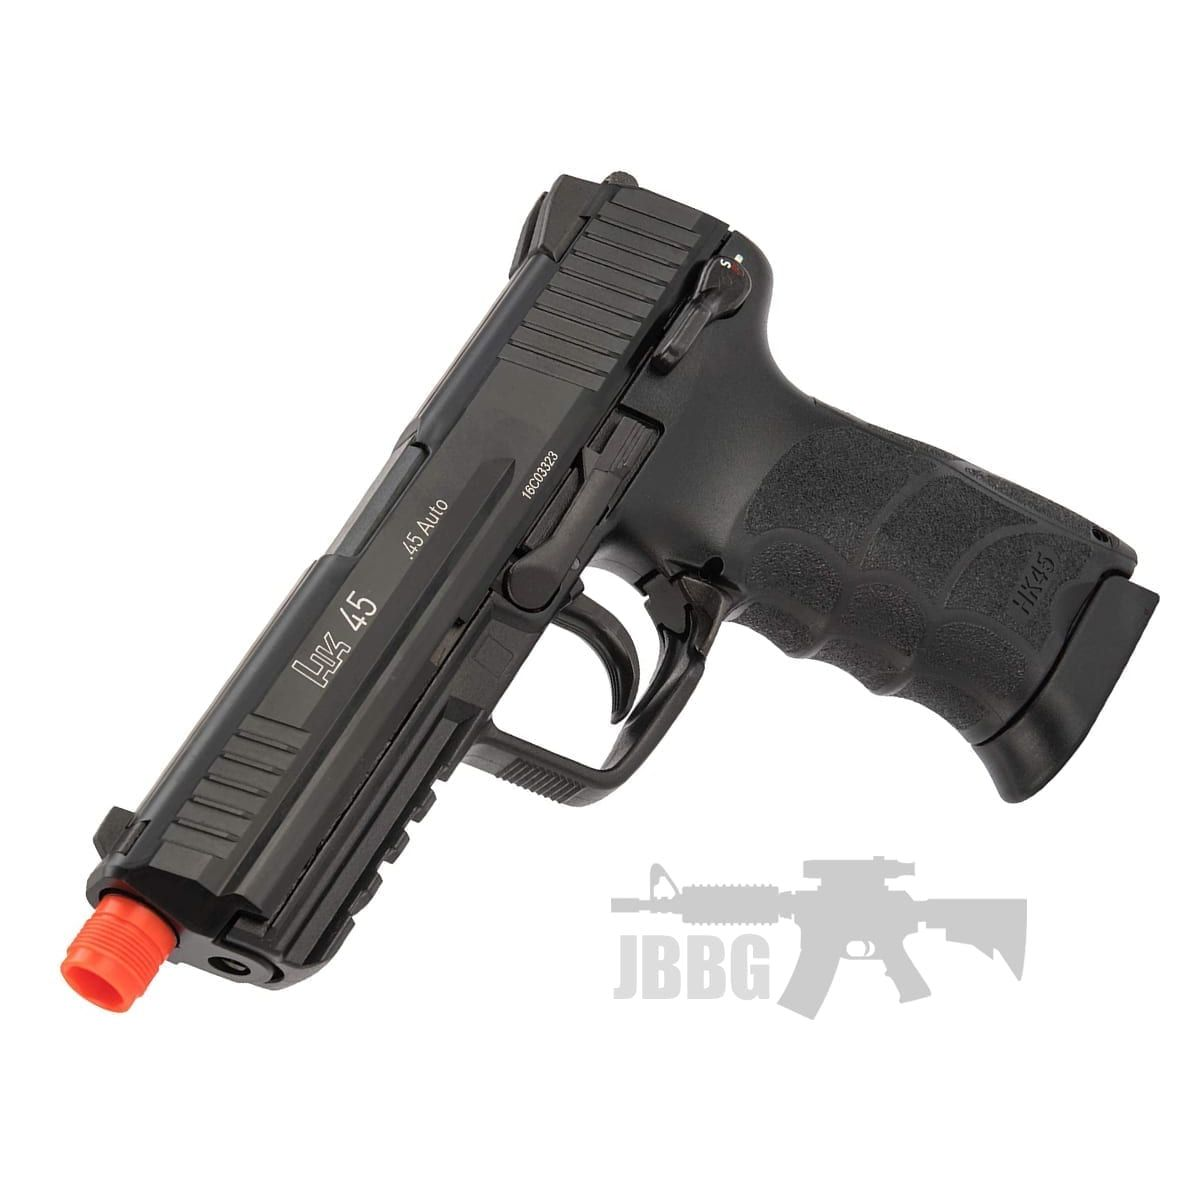 hk45 airsoft pistol